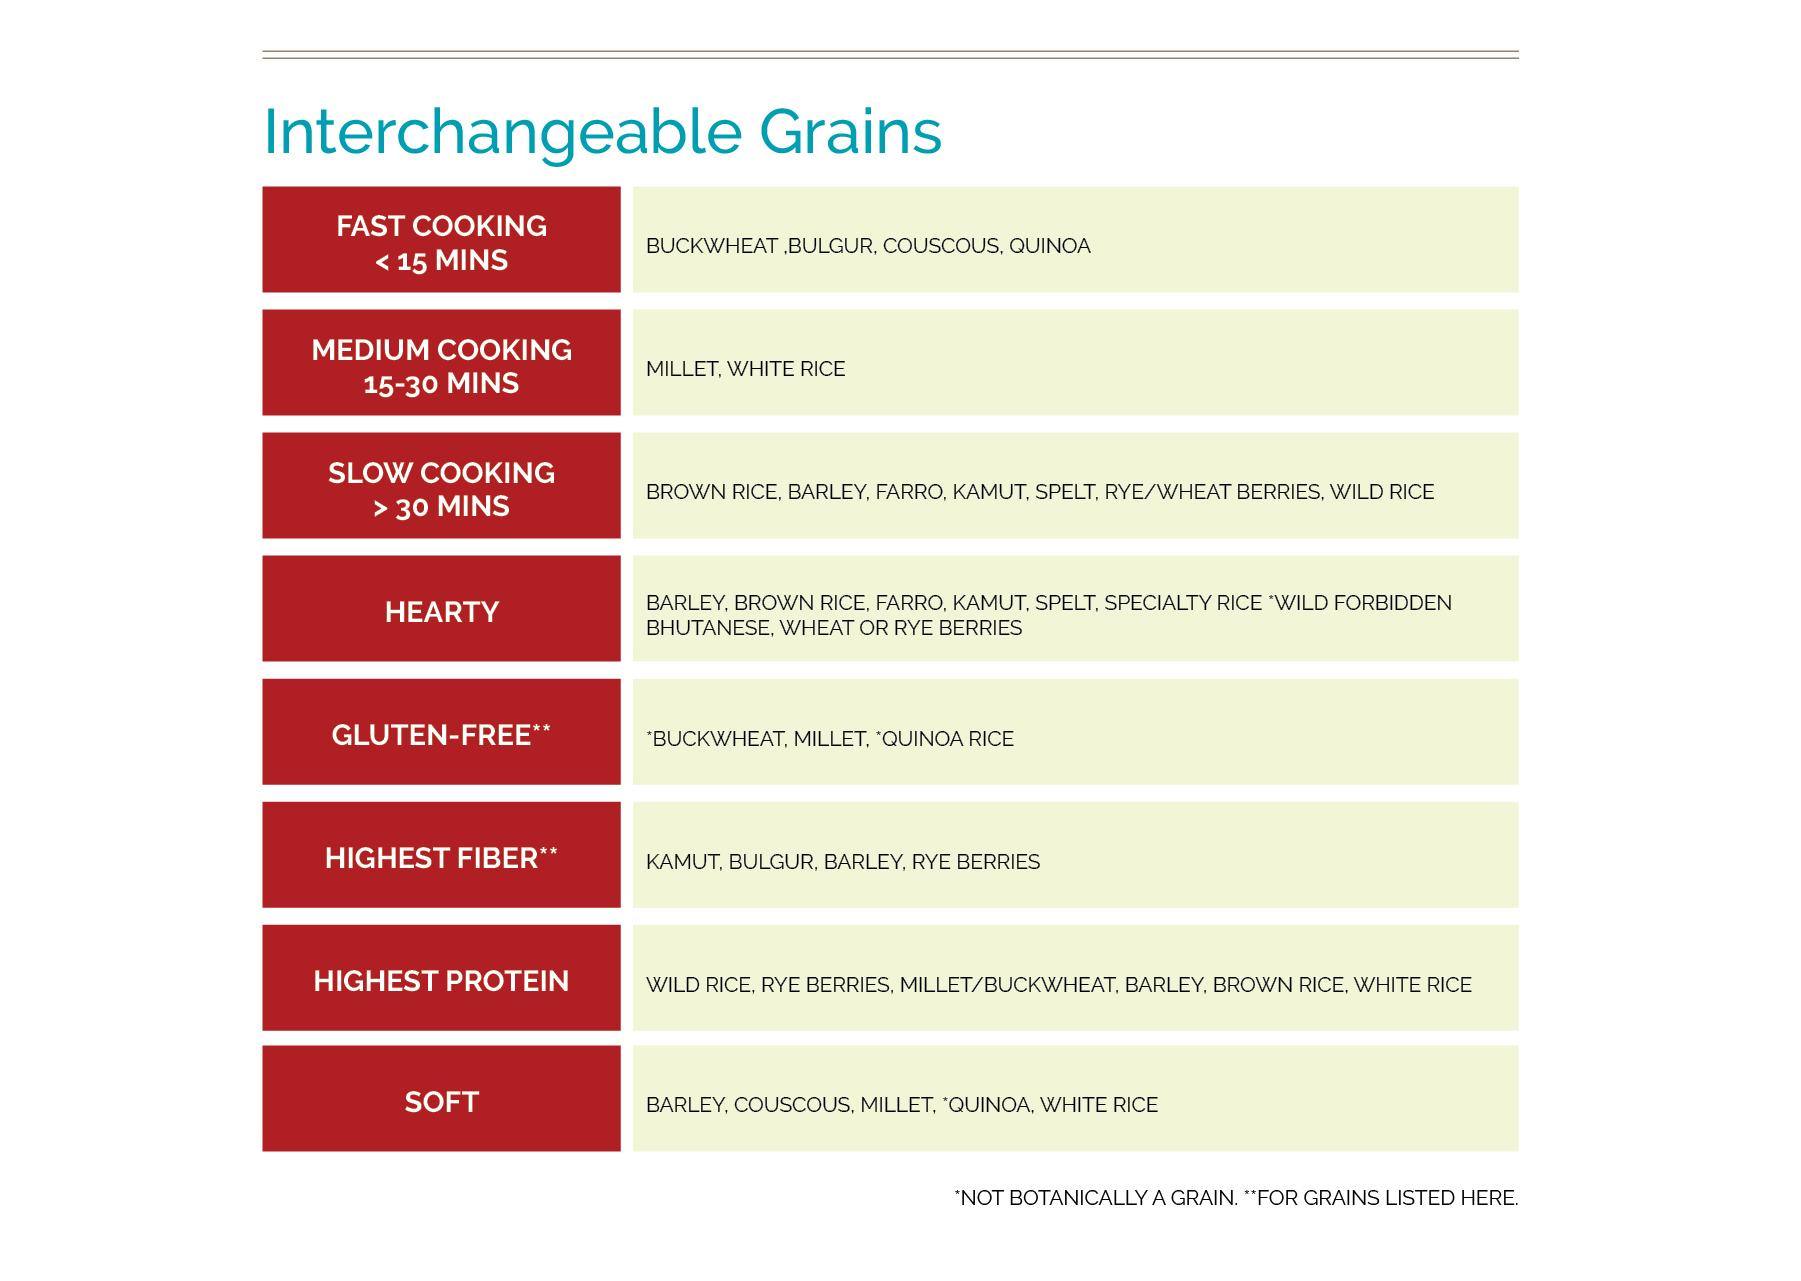 Interchangeable grains.jpg